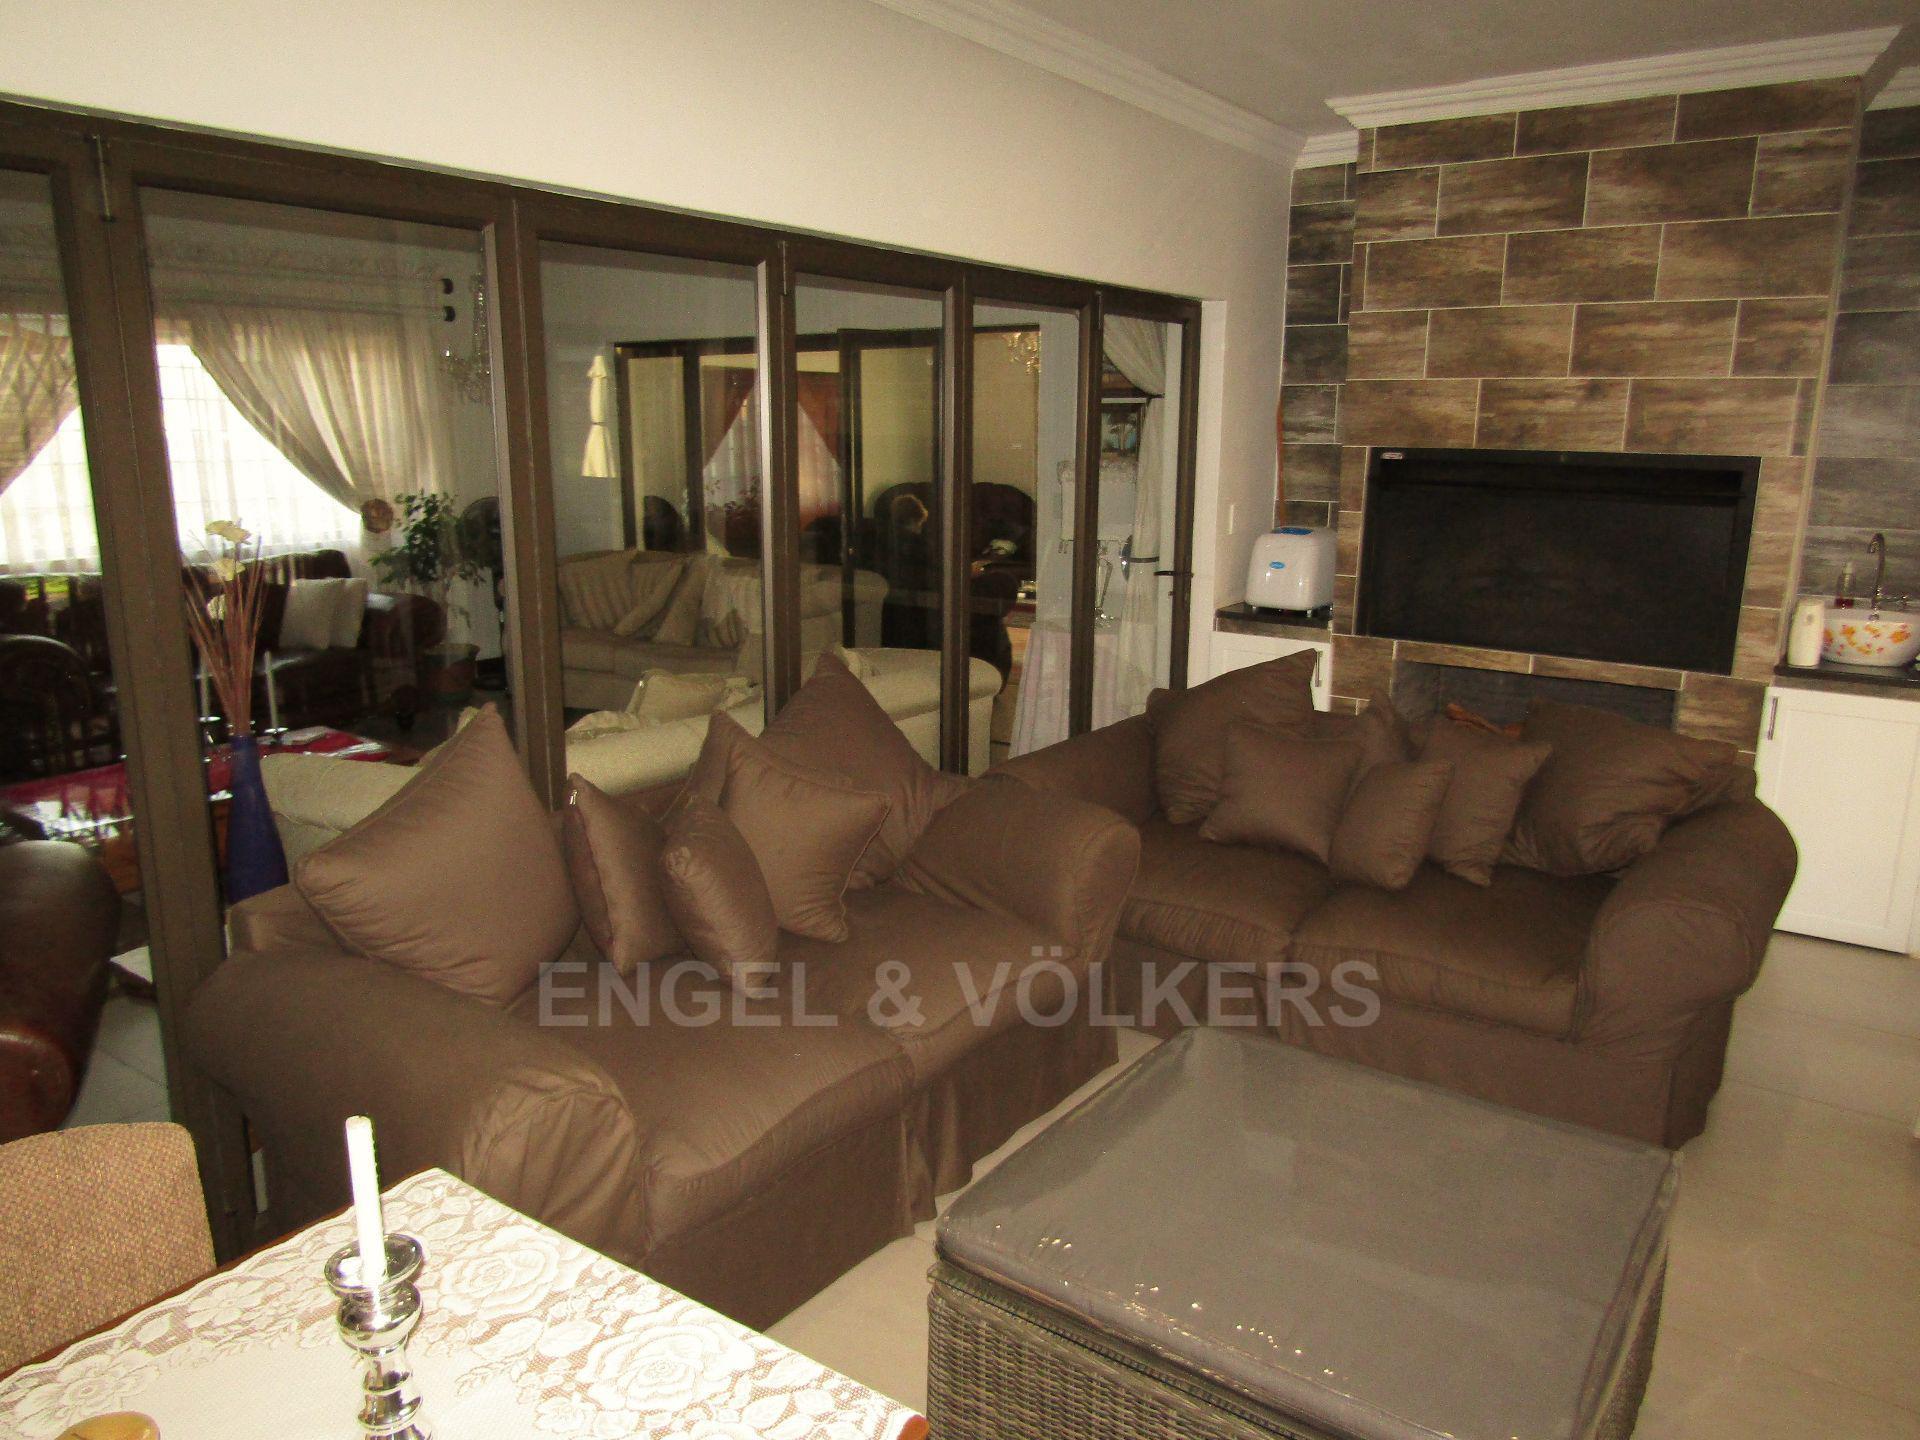 Lifestyle Estate property for sale. Ref No: 13458759. Picture no 10